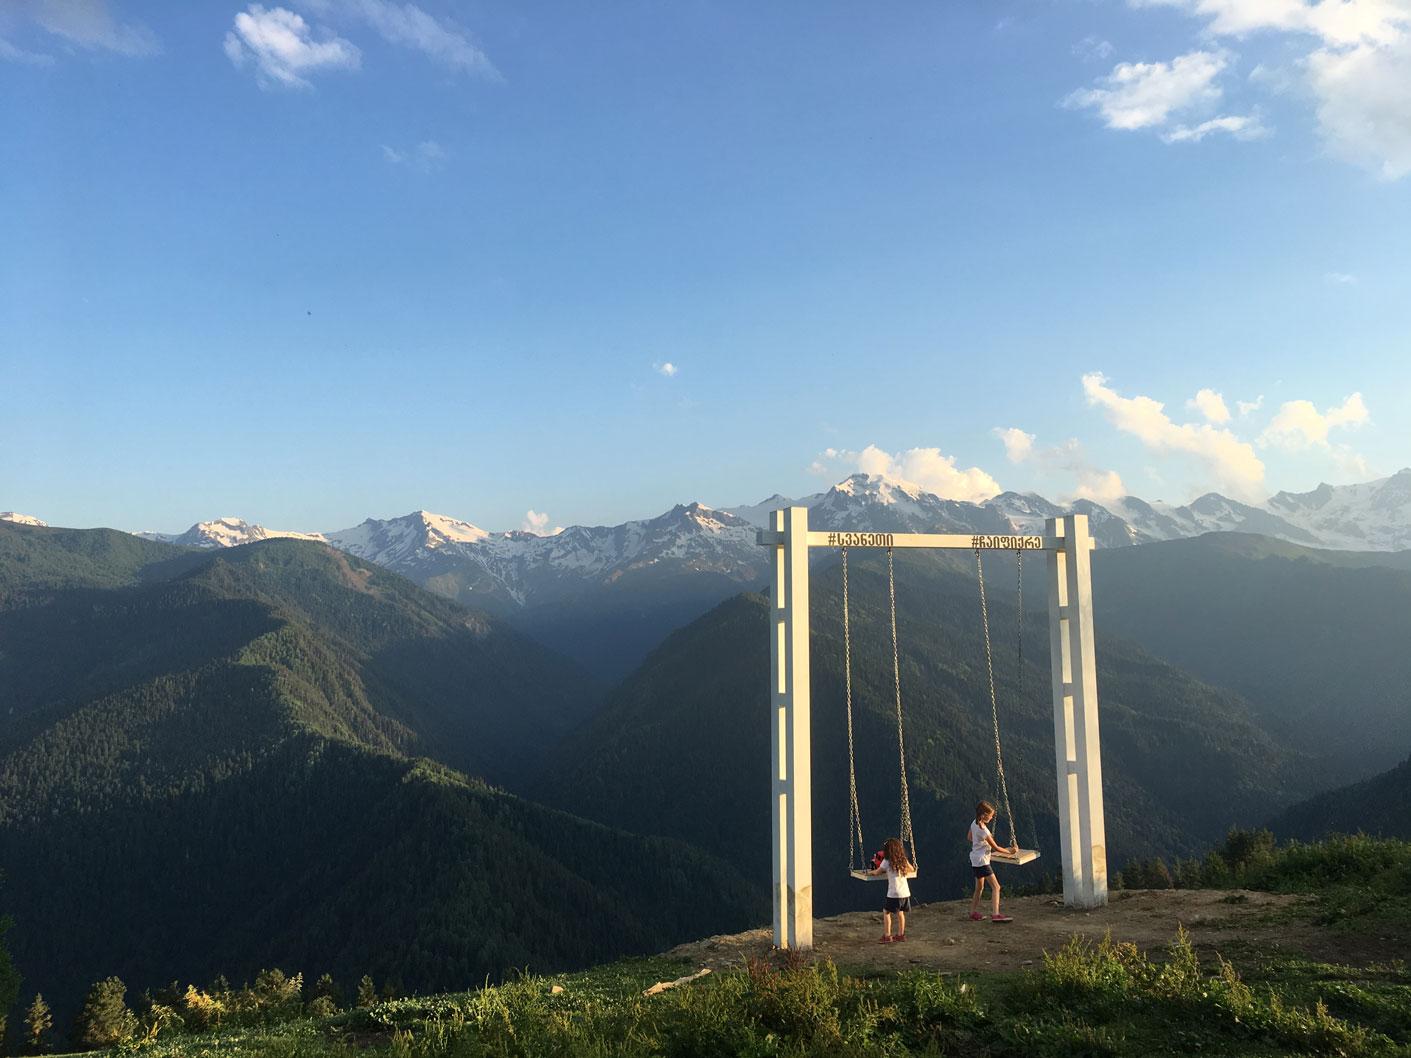 Výhled na hory v Gruzii - Direct blog